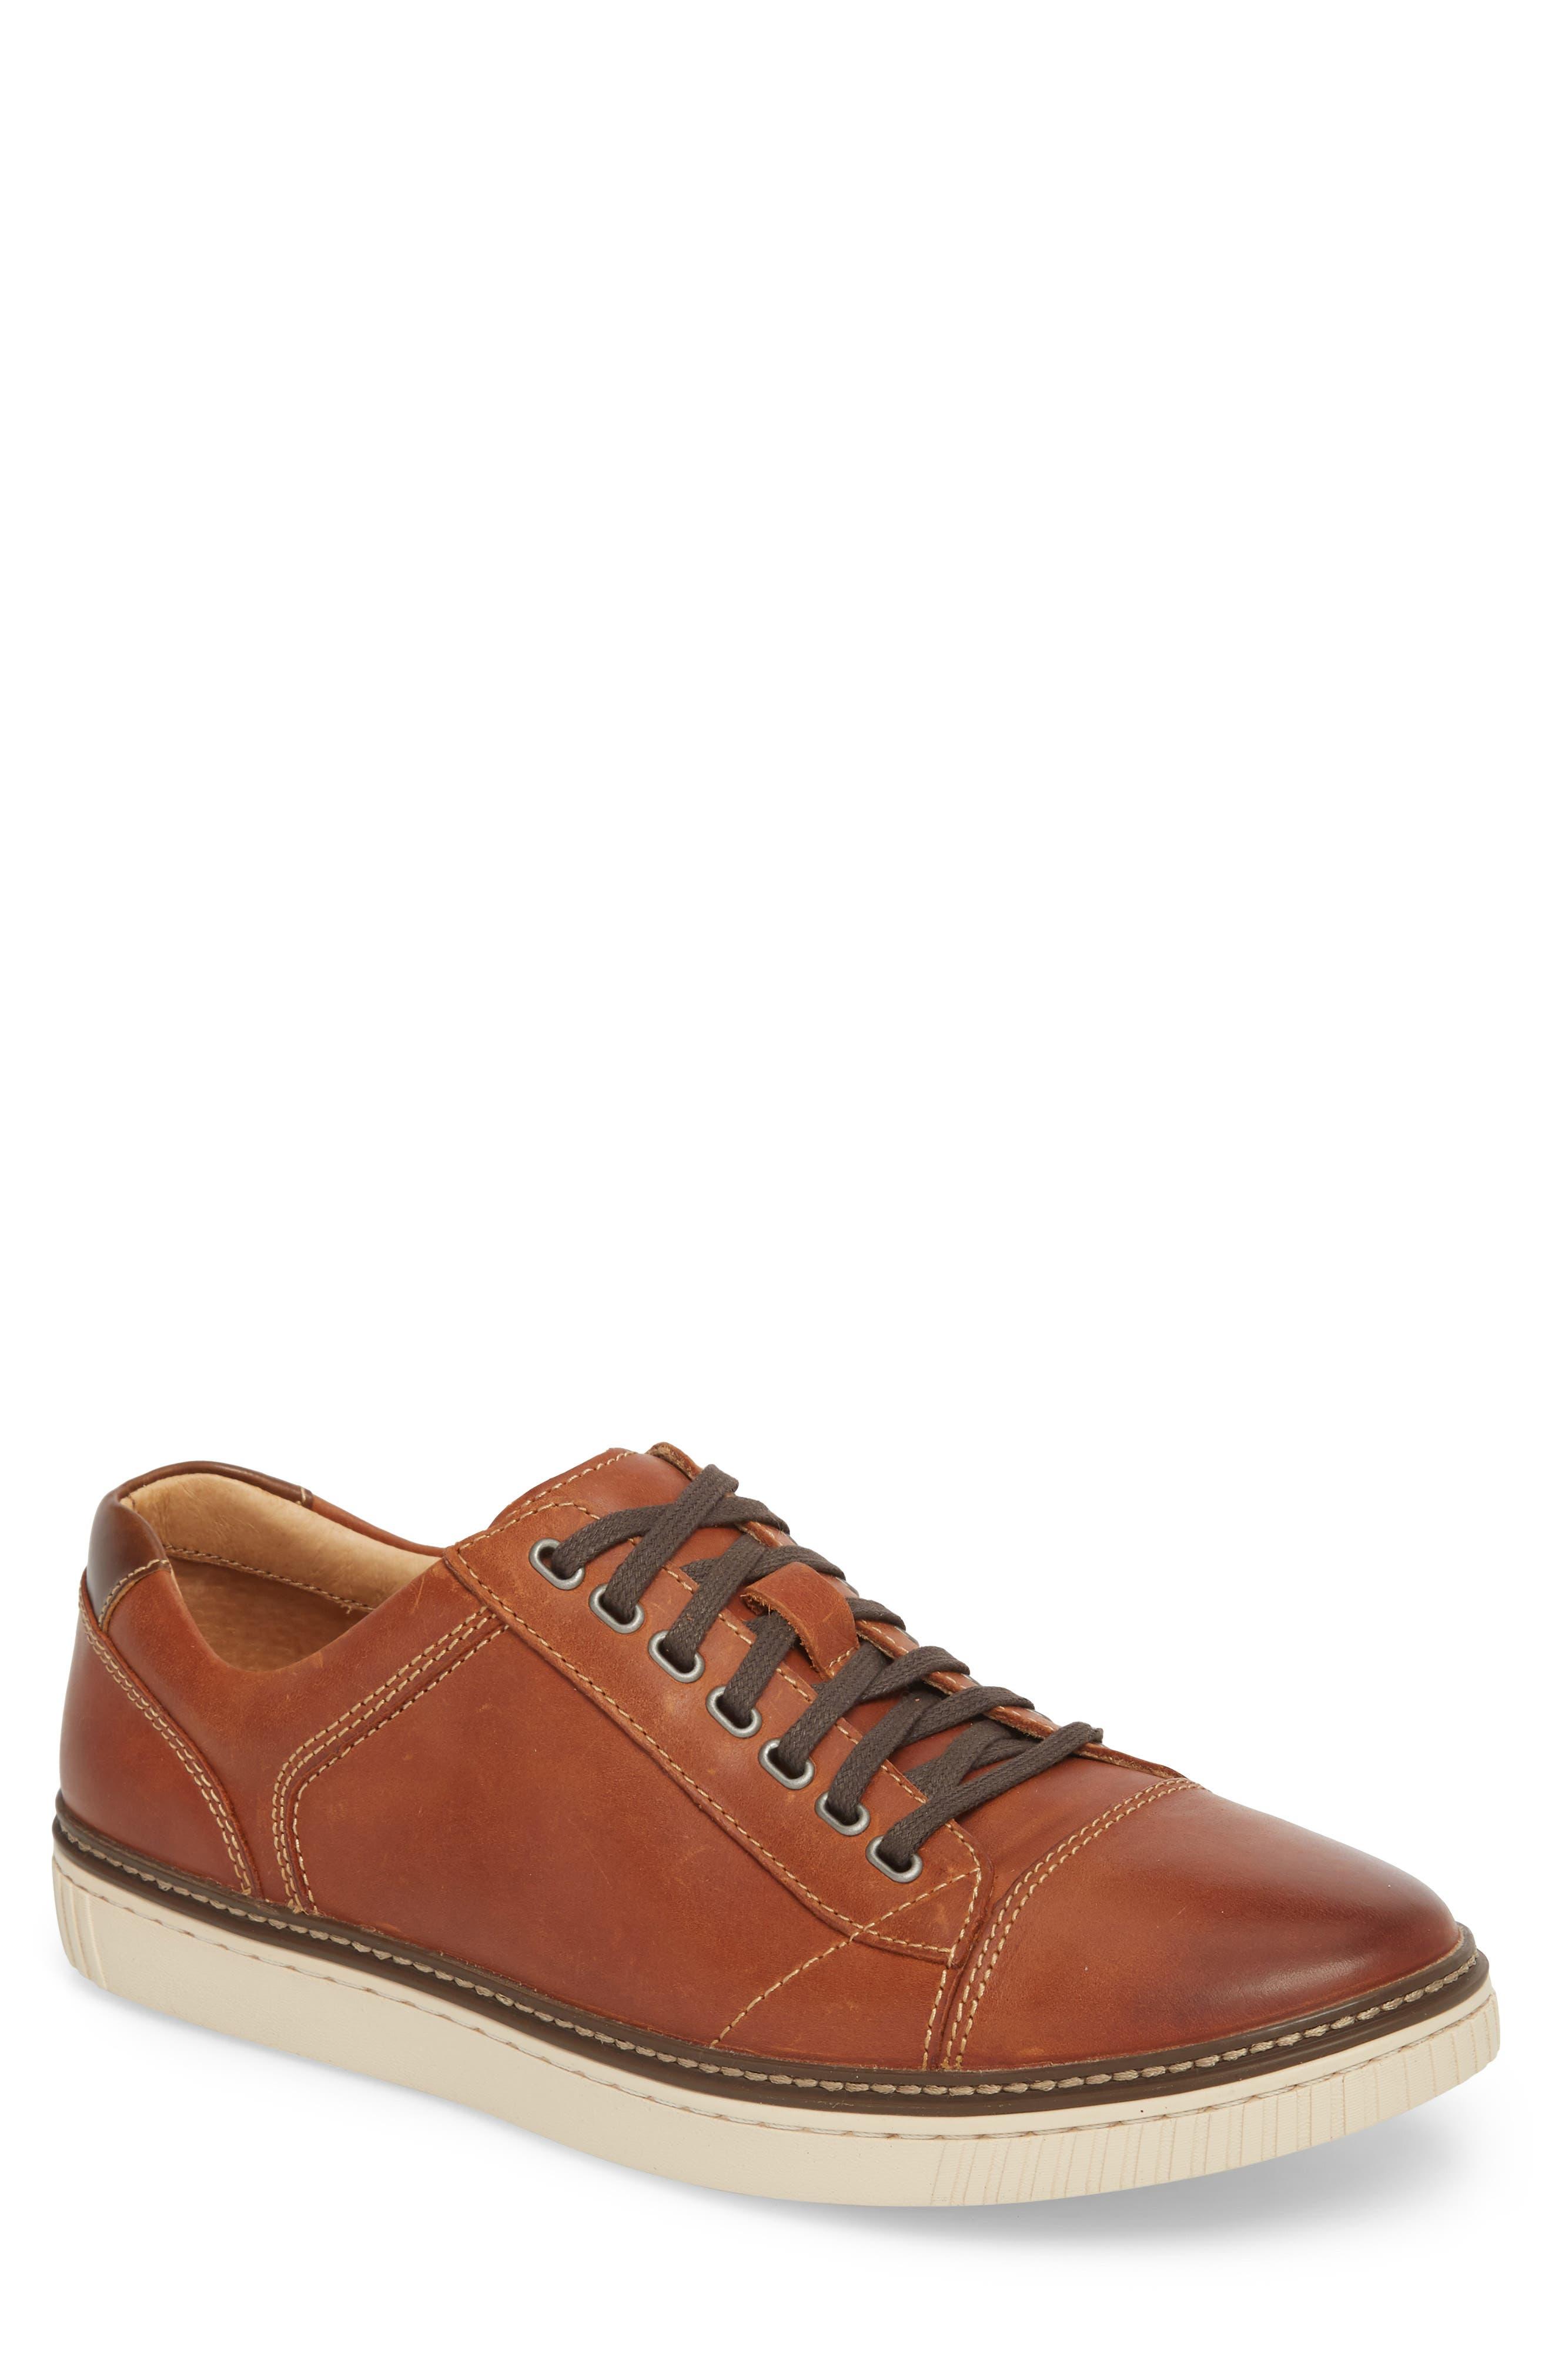 Wallace Low Top Sneaker,                             Main thumbnail 1, color,                             Tan Nubuck